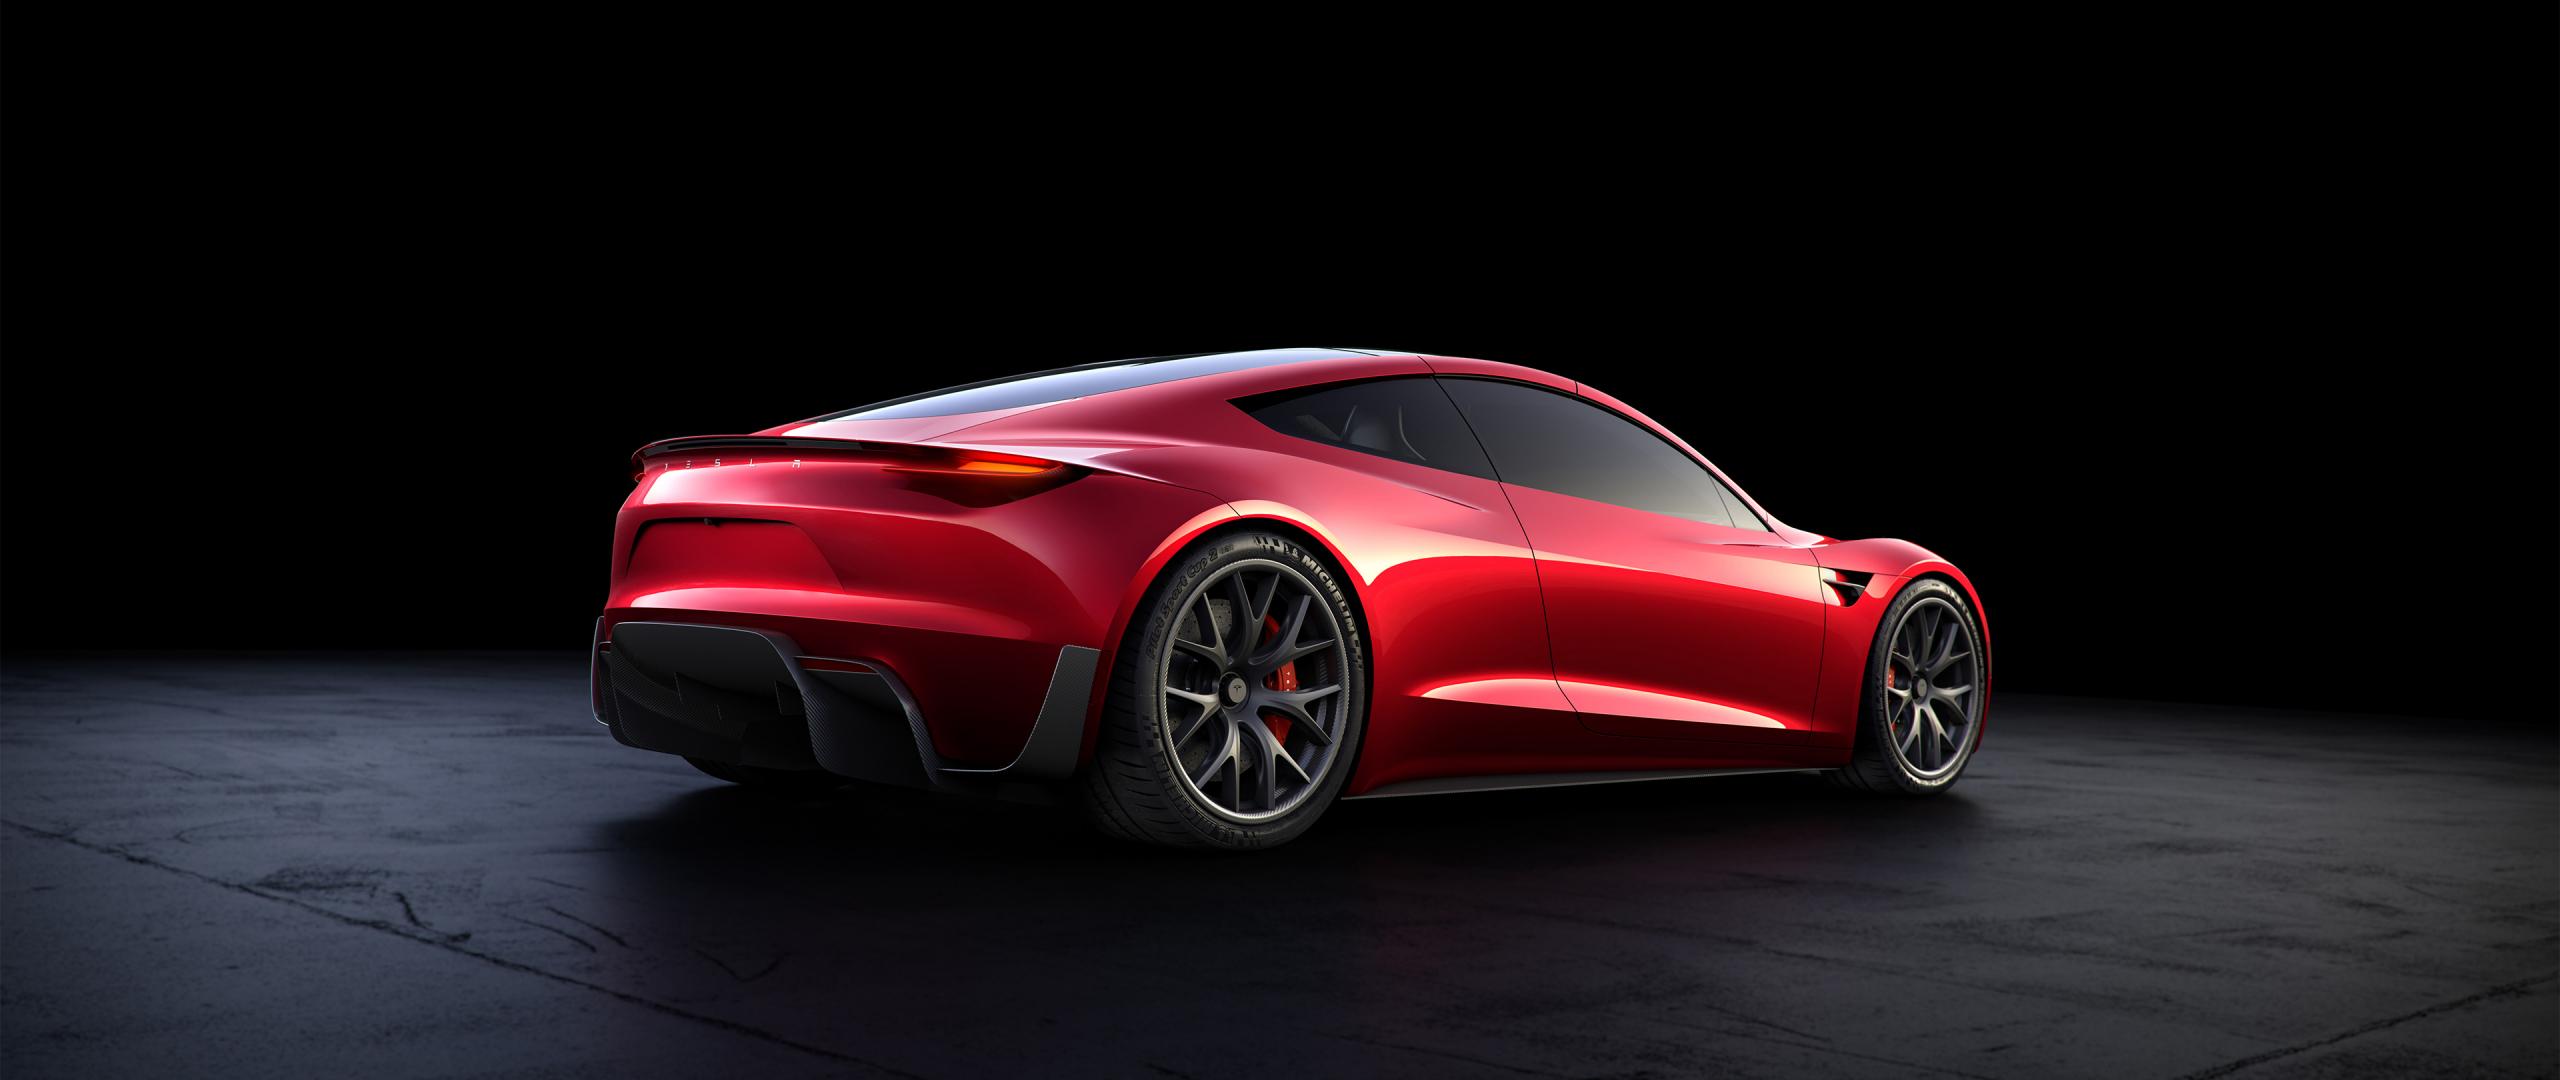 download 2560x1080 wallpaper tesla roadster, red car, rear view, 4k